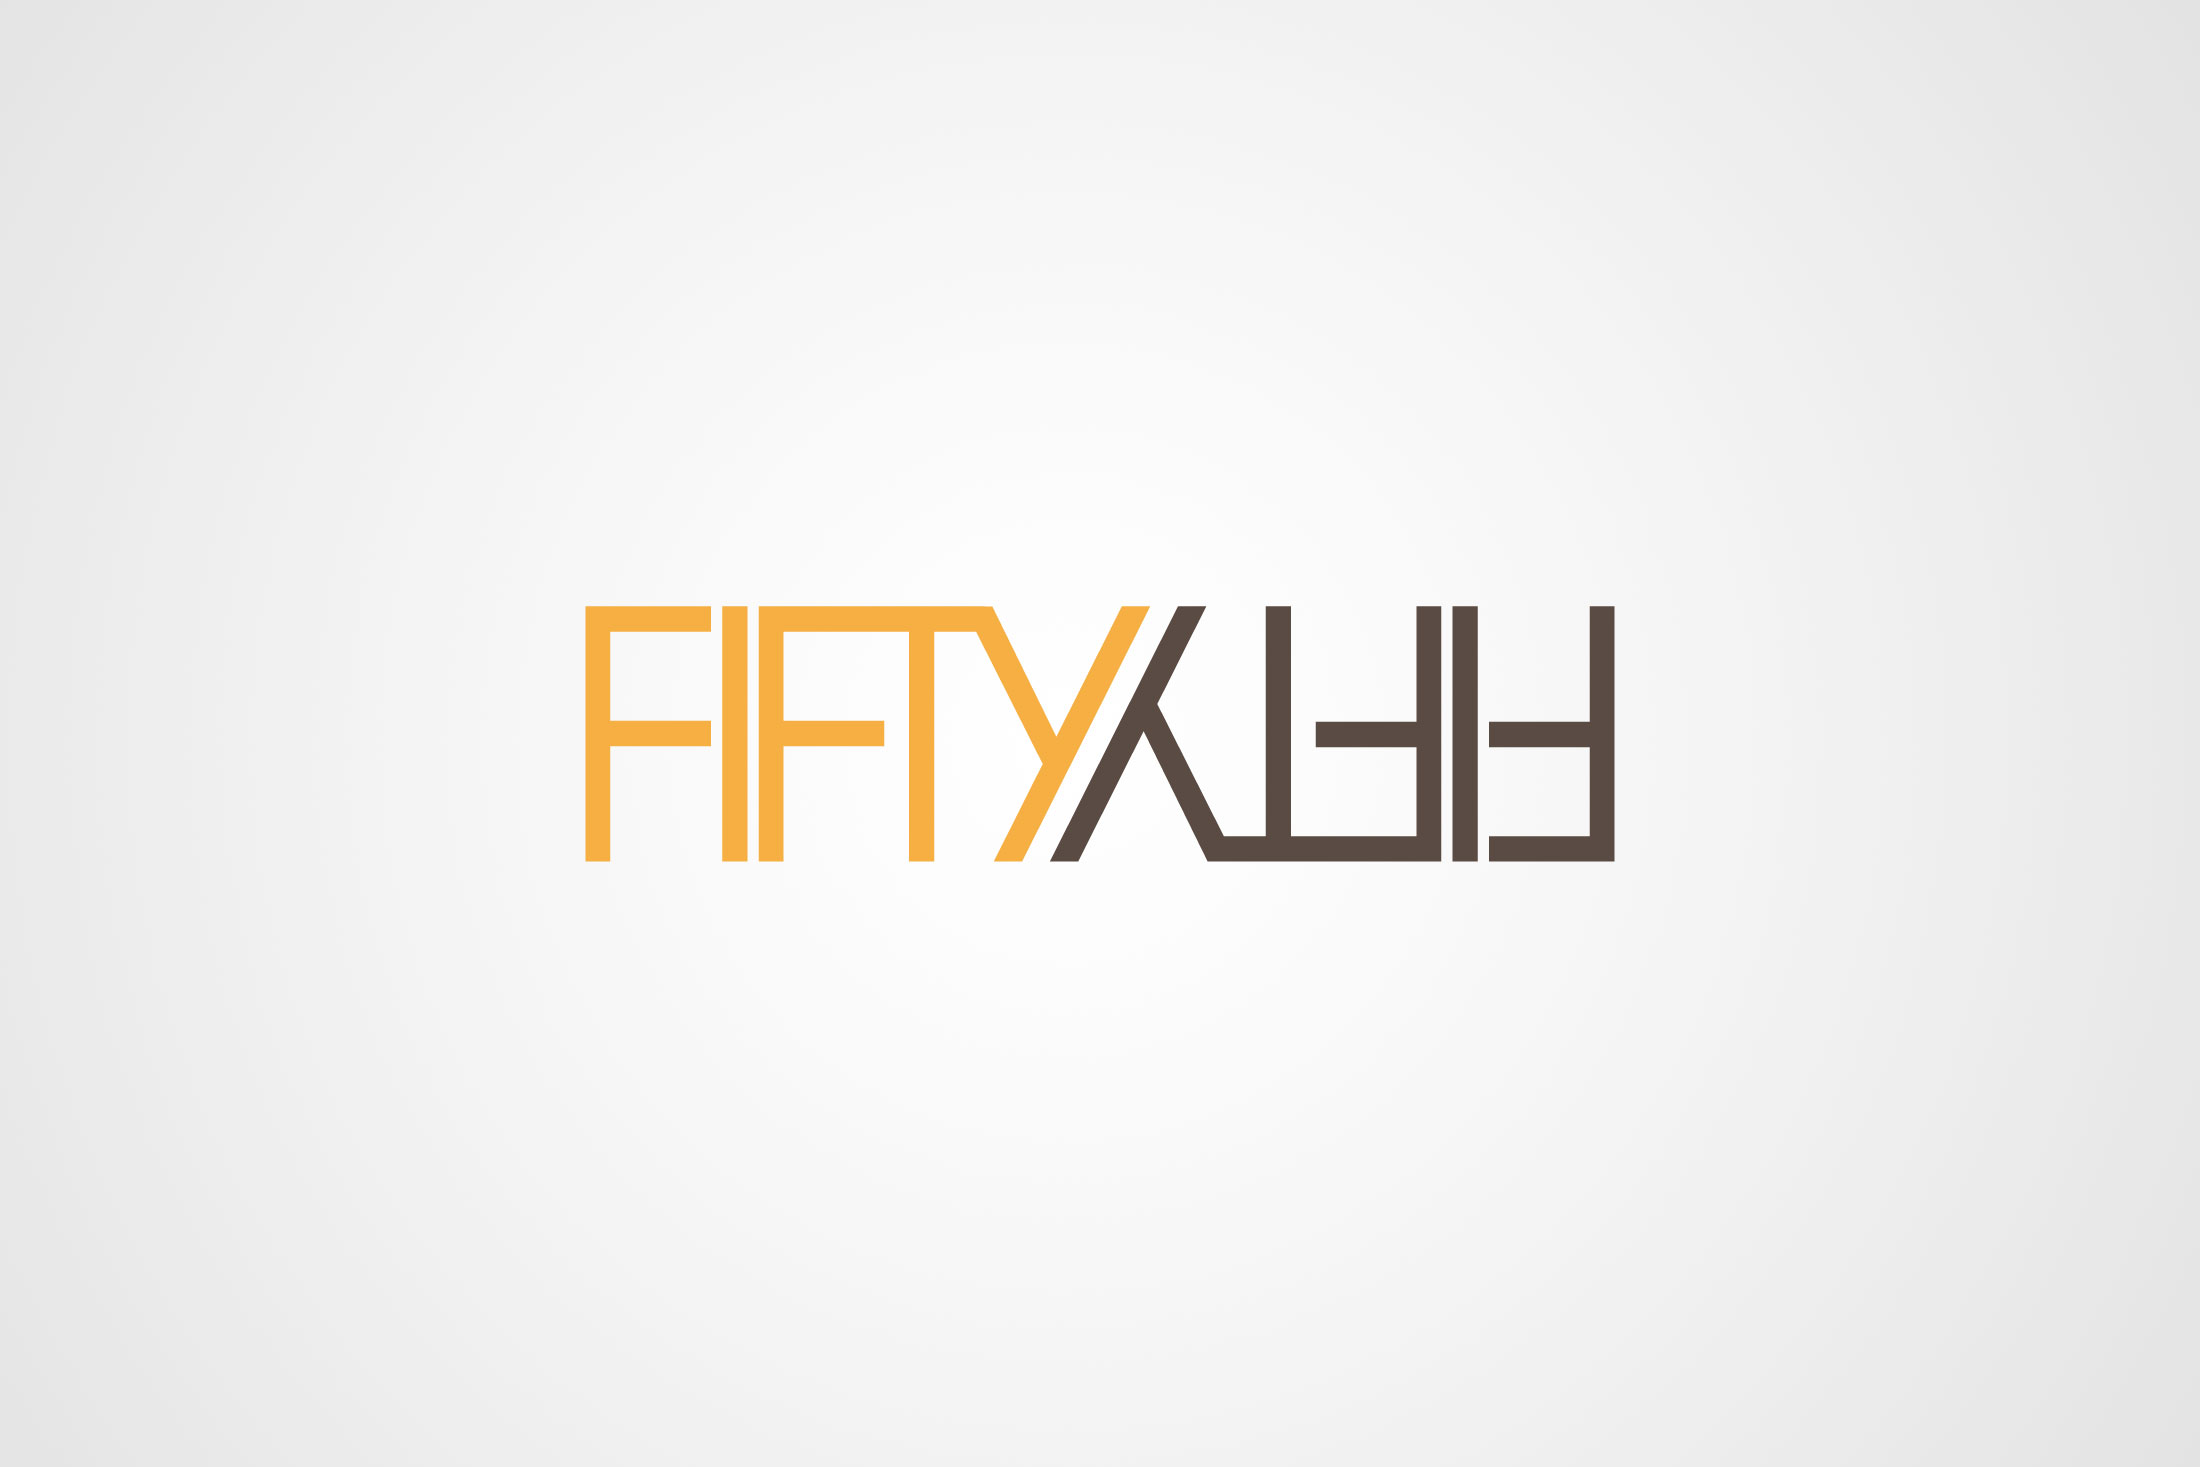 fiftyfiftylogo